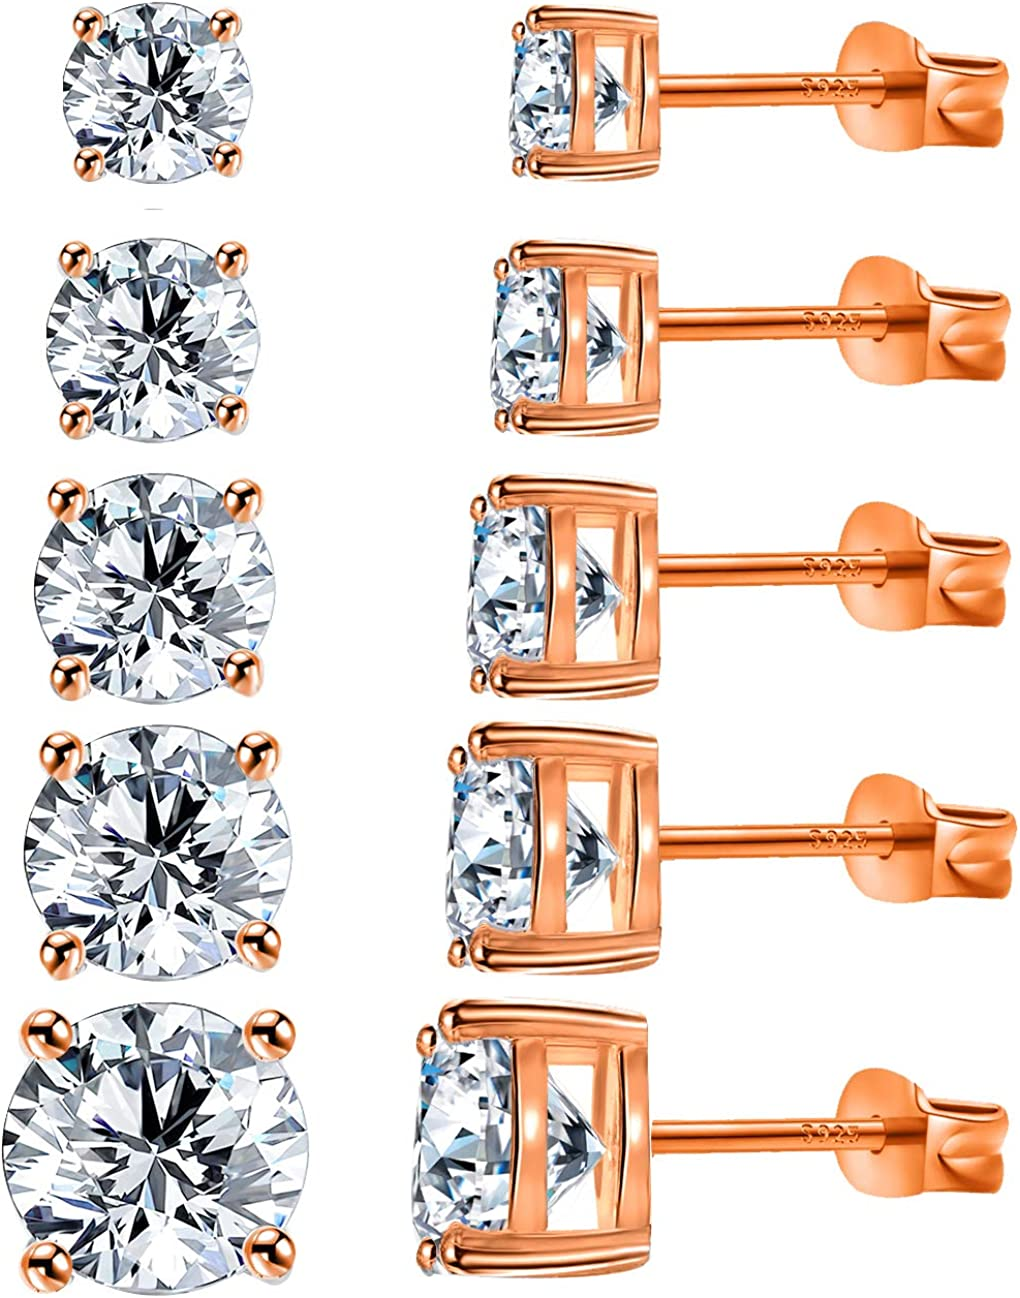 TTOCH Stud Earrings 18K Gold Plated 925 Sterling Silver Post Cubic Zirconia Simulated Diamond Earrings 5 Pairs Ear Stud Set for Women/Girl/Men